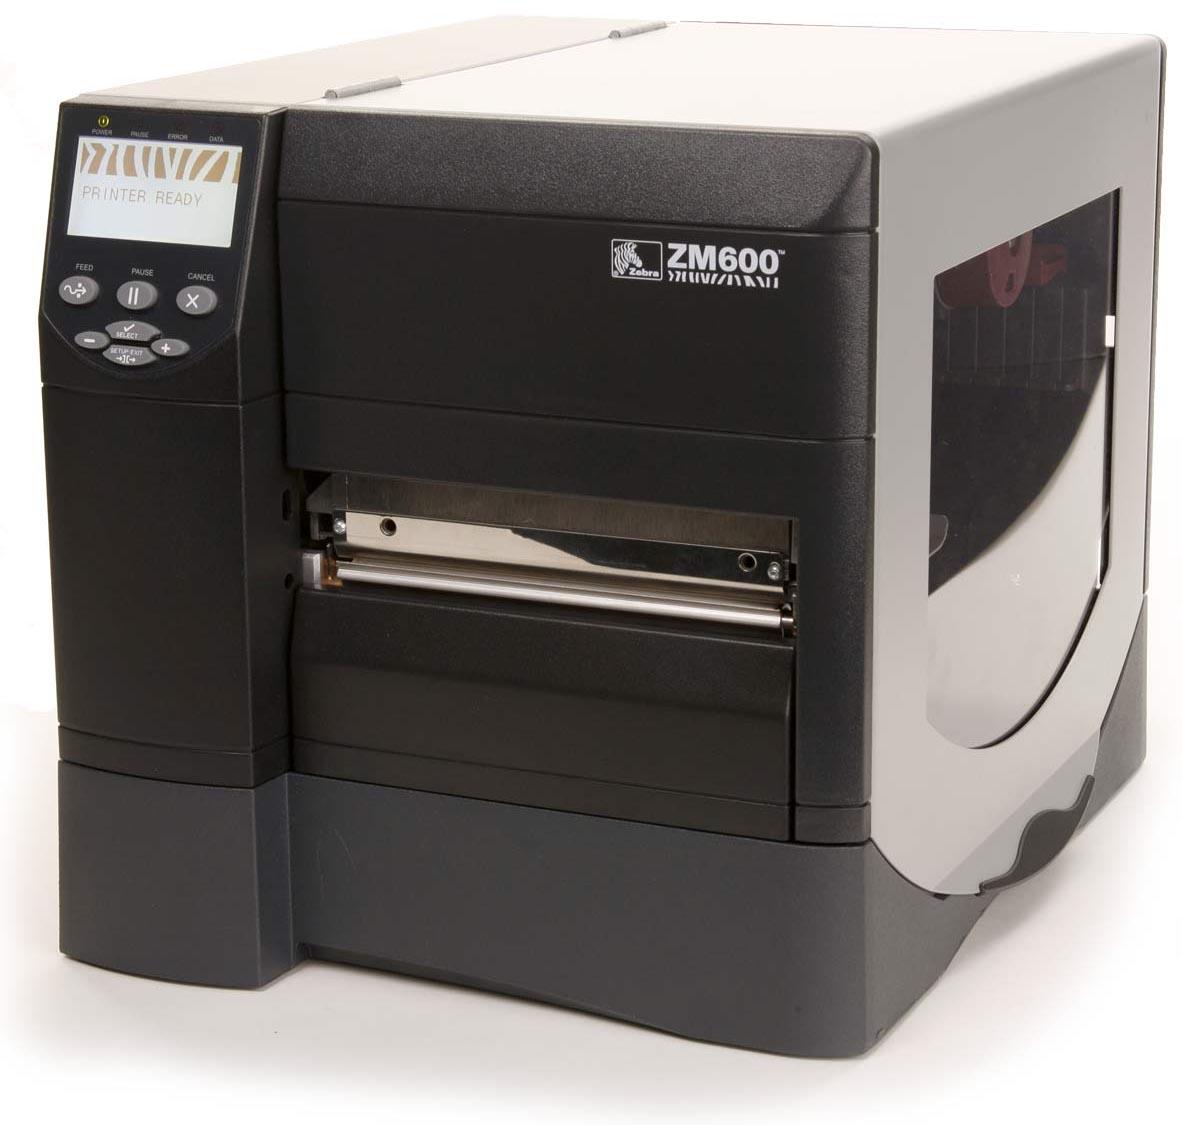 Термотрансферный принтер Zebra ZM600-200E-0000T